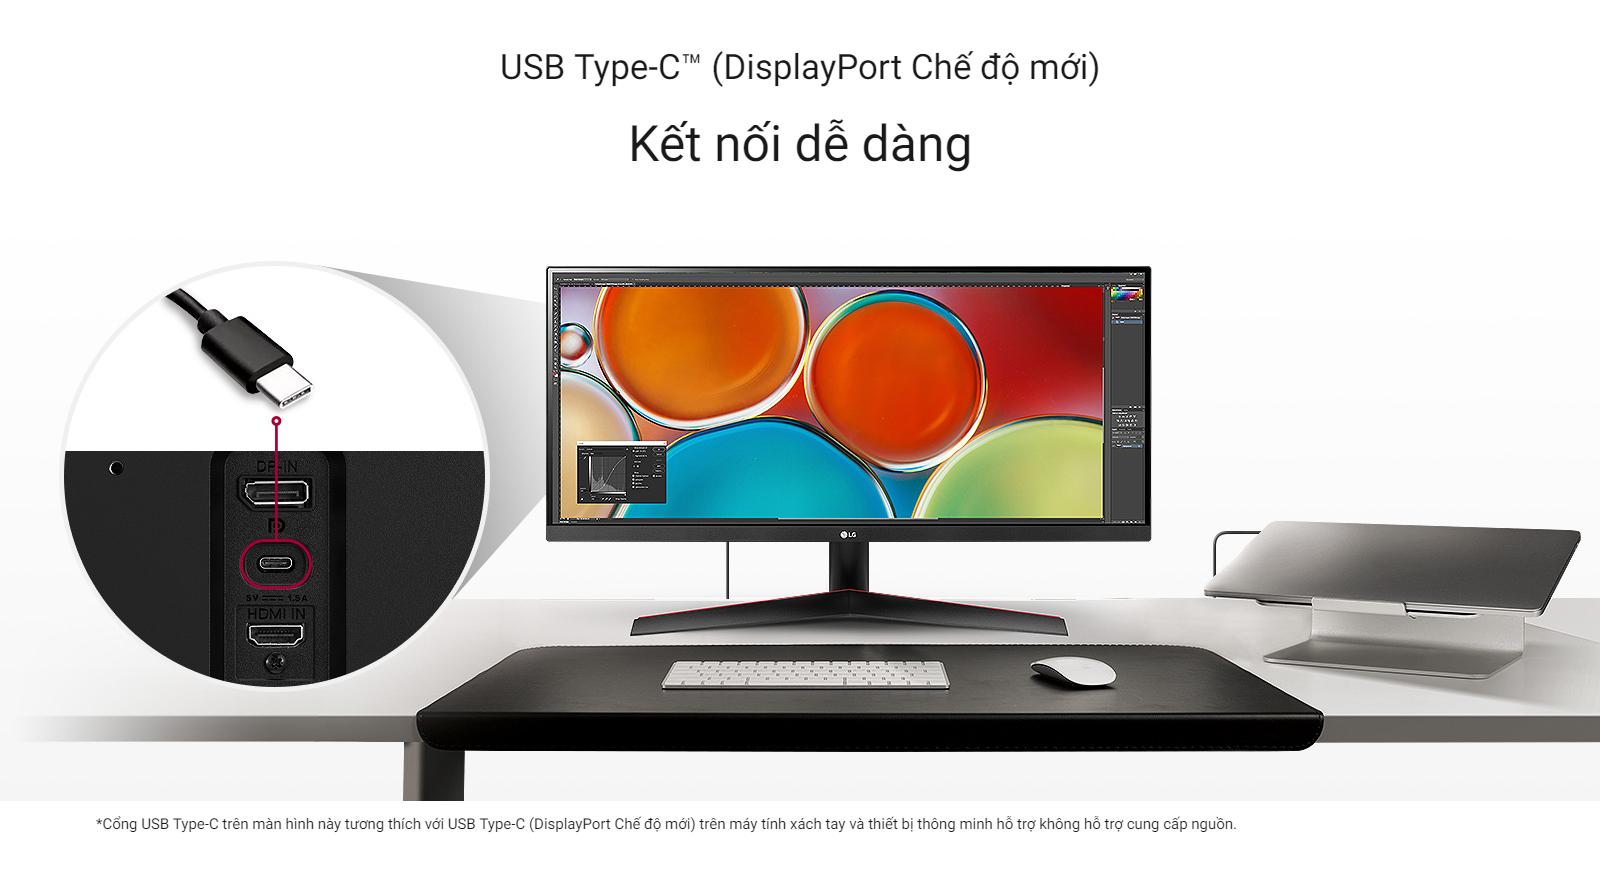 USB Type-C™ (DisplayPort Chế độ mới)